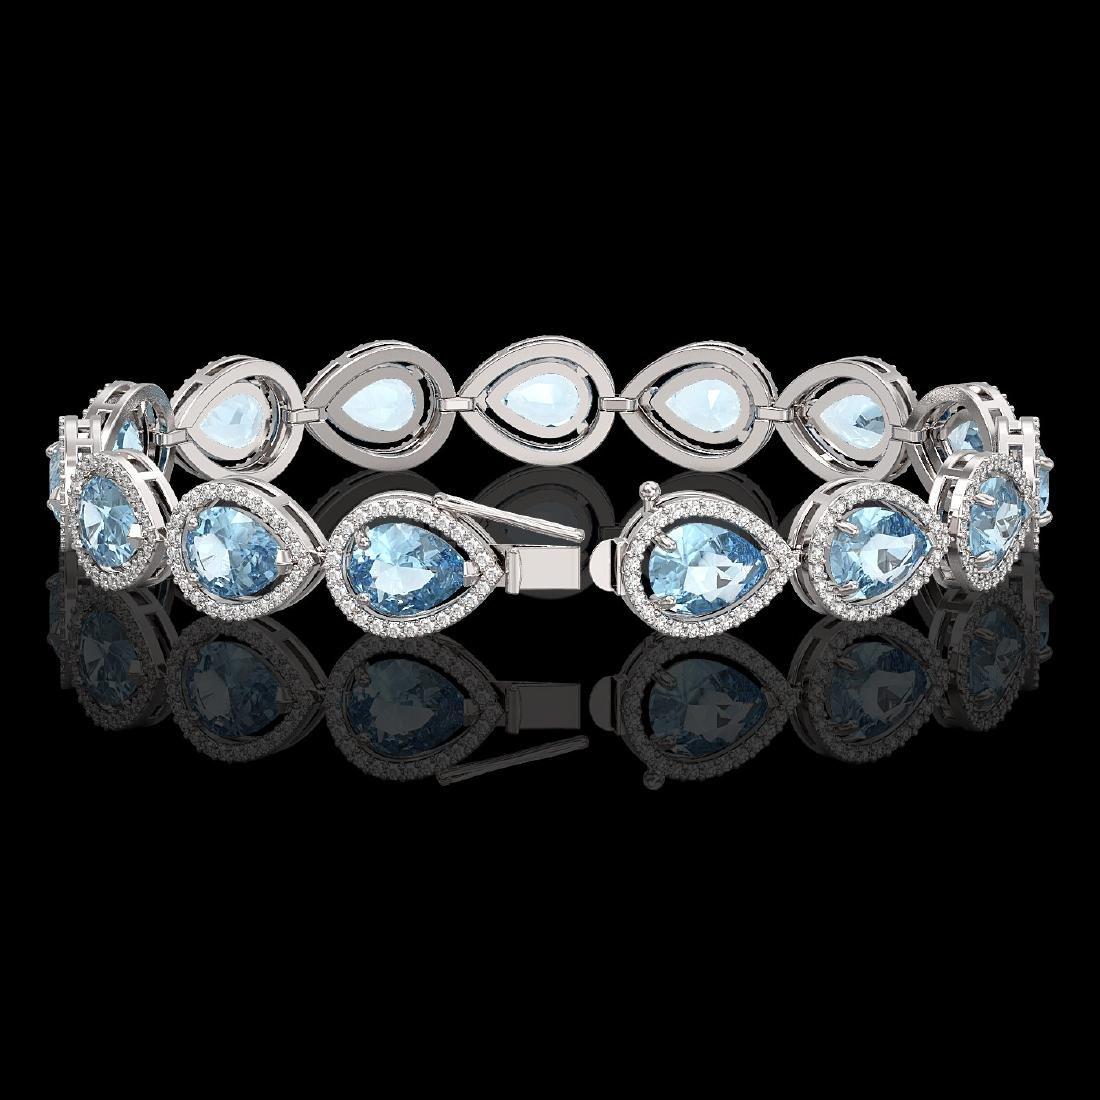 19.55 CTW Sky Topaz & Diamond Halo Bracelet 10K White - 2